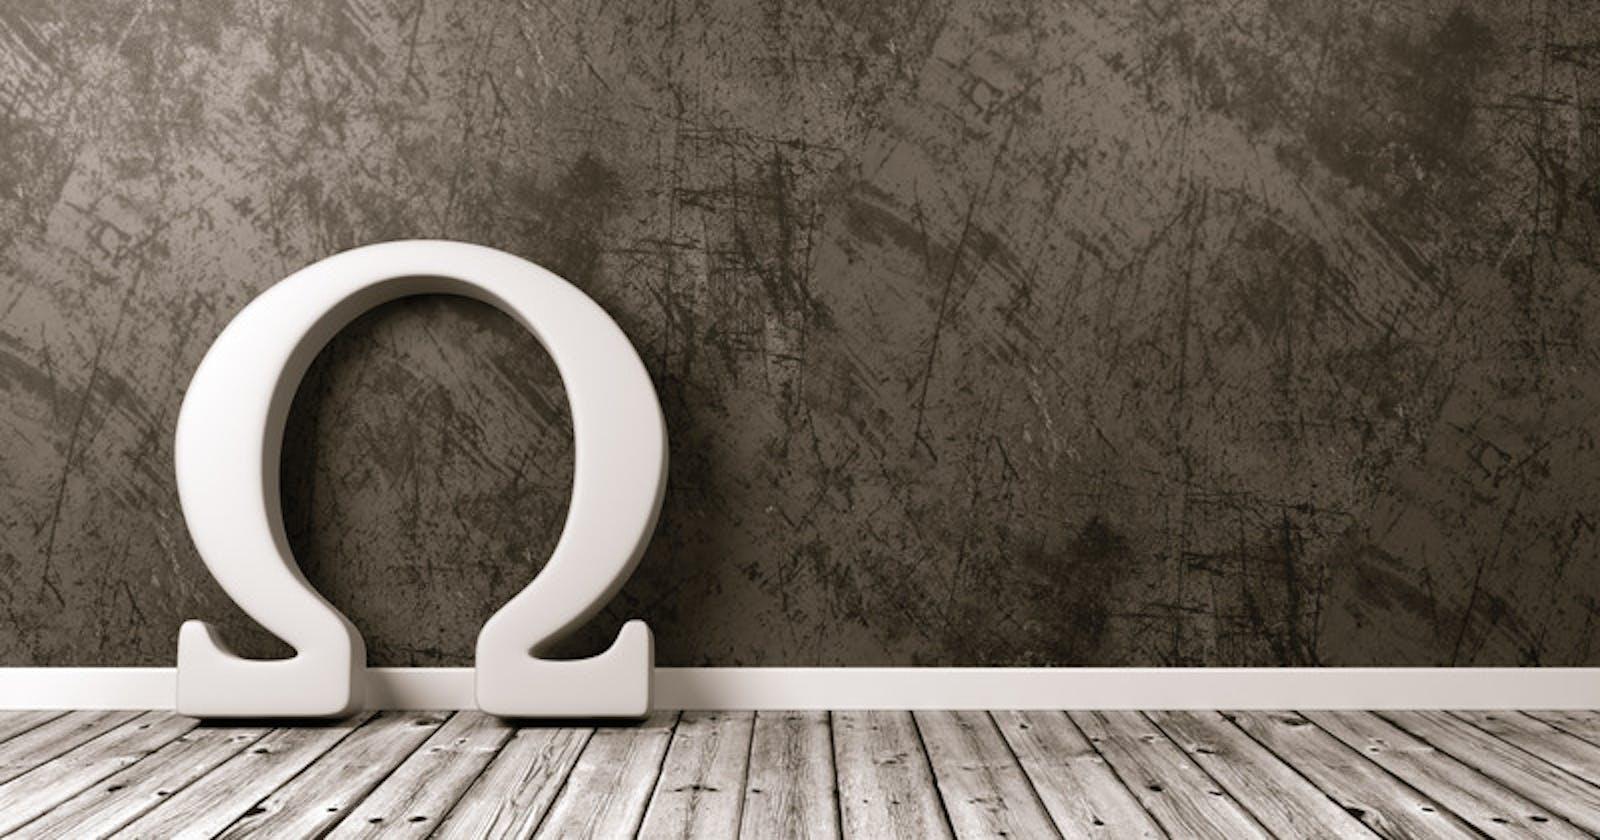 Big O notation and the Bachmann-Landau family